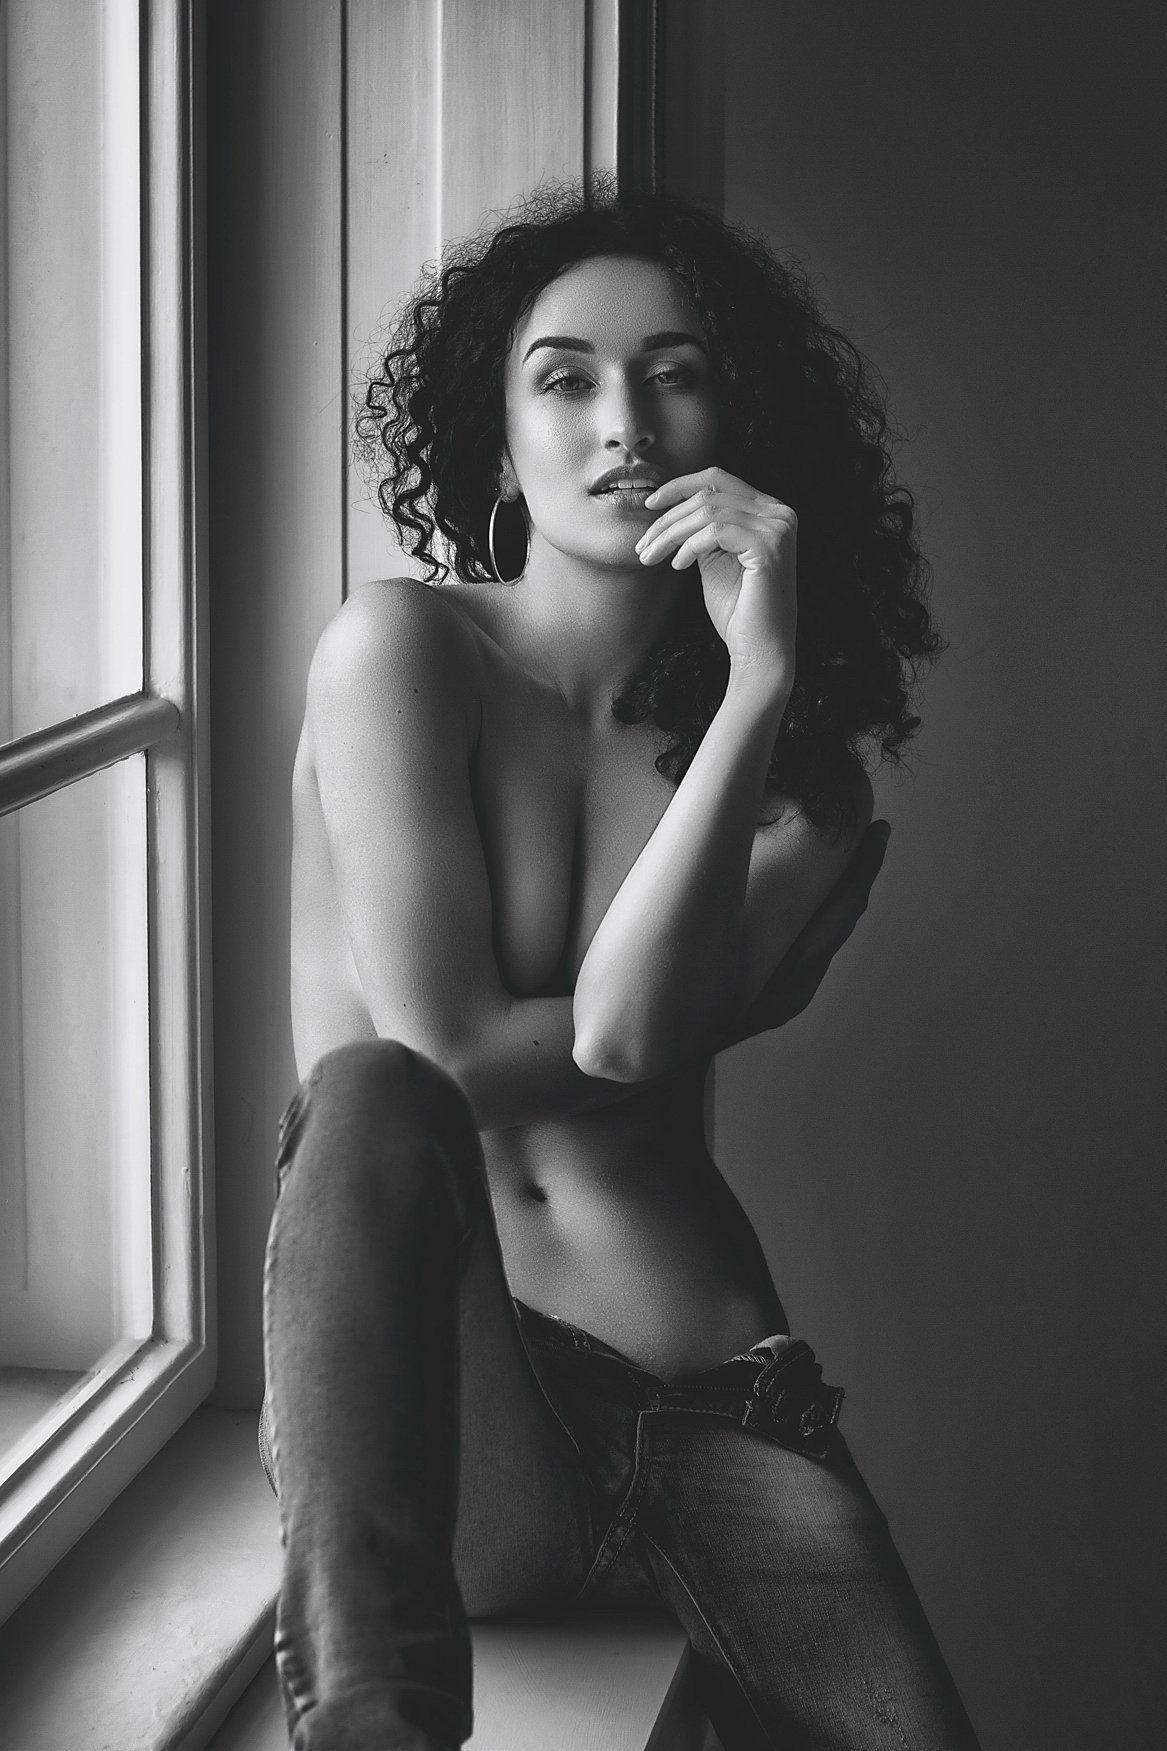 model, fine art, sexy, sensual, black and white, woman, female, body, erotica, glamour, curves, portrait, beautiful, fashion, implied nude, implied,, Lajos Csáki